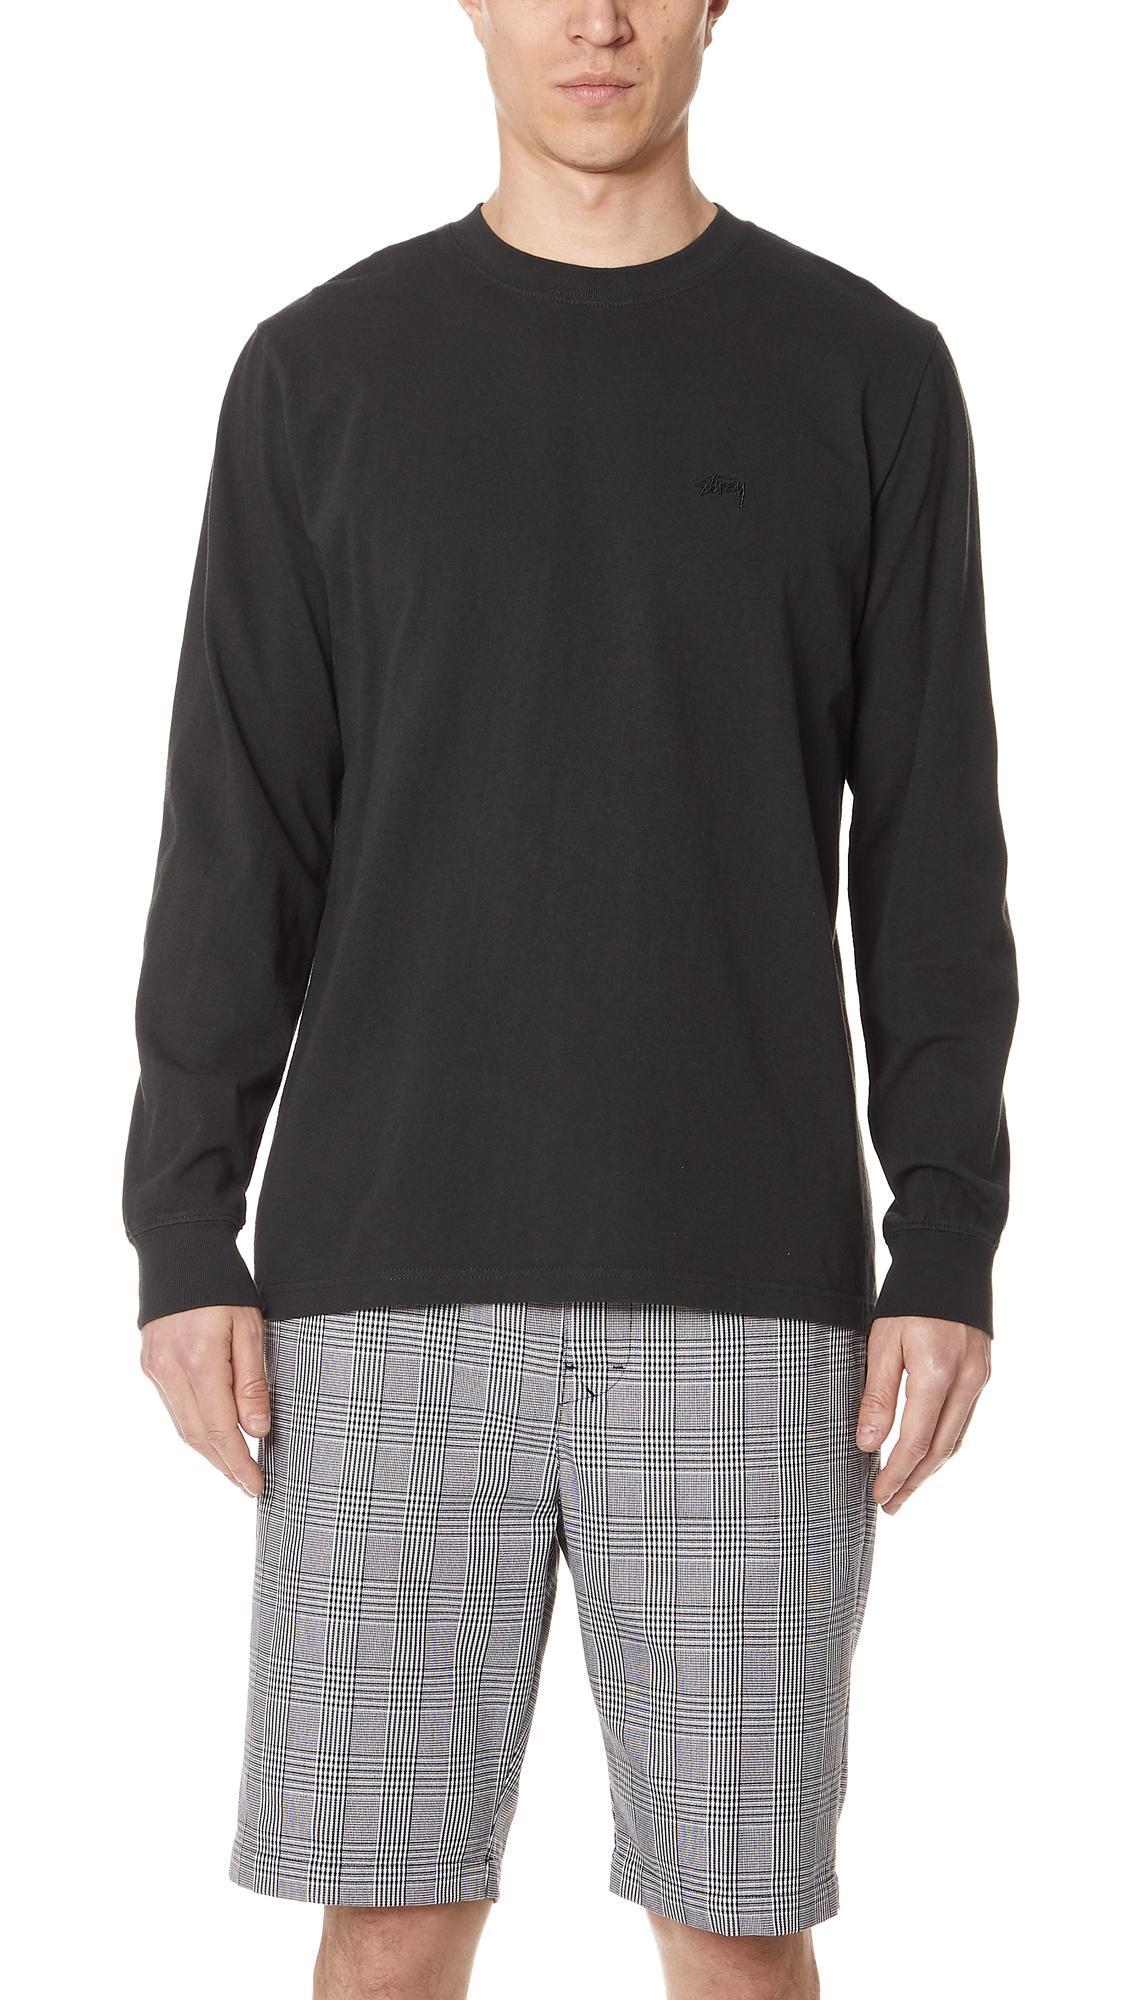 ddf40a86 Stussy Stock Long Sleeve Jersey Tee In Black | ModeSens